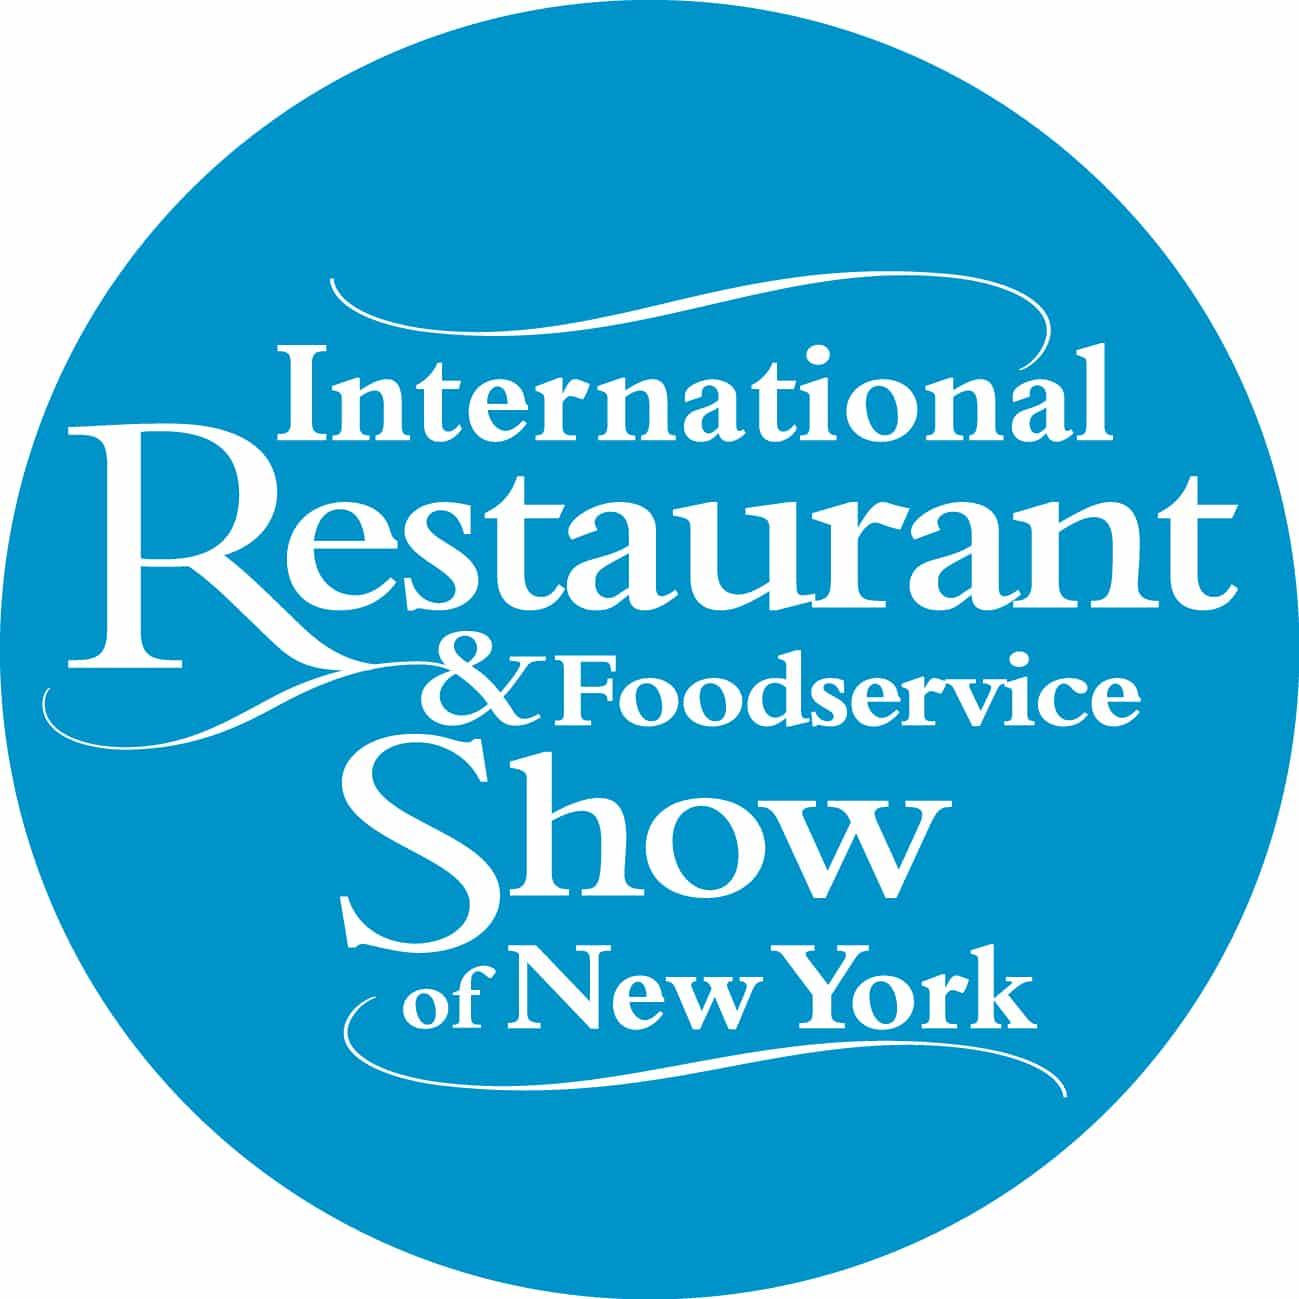 IRNY Show - New York 2017